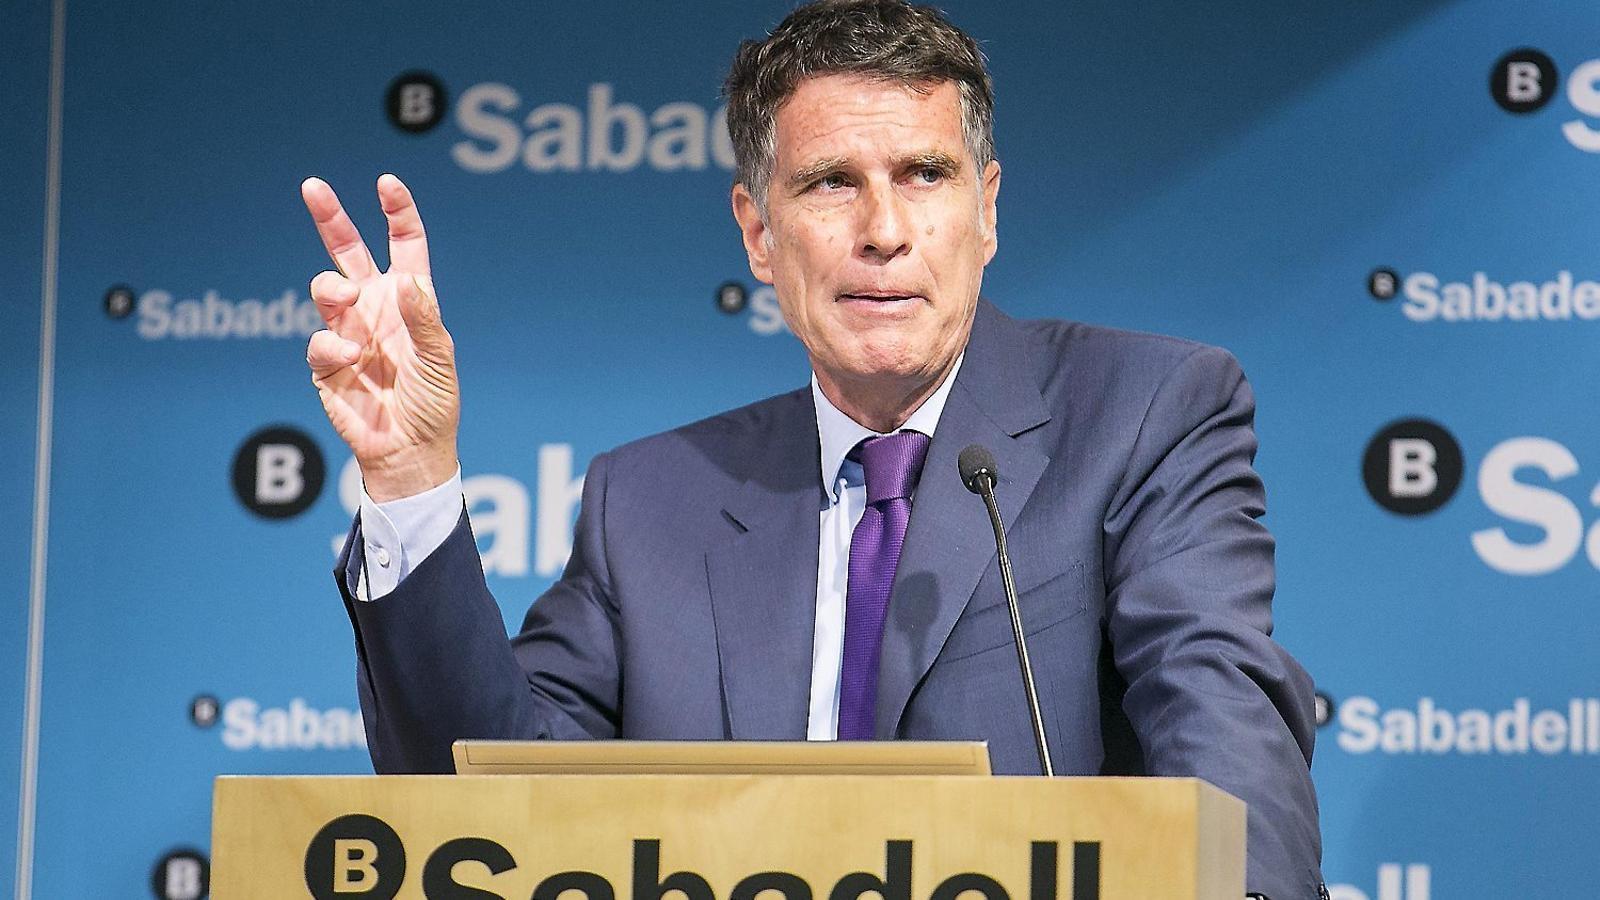 Sabadell i Bankia avisen d'una frenada del benefici